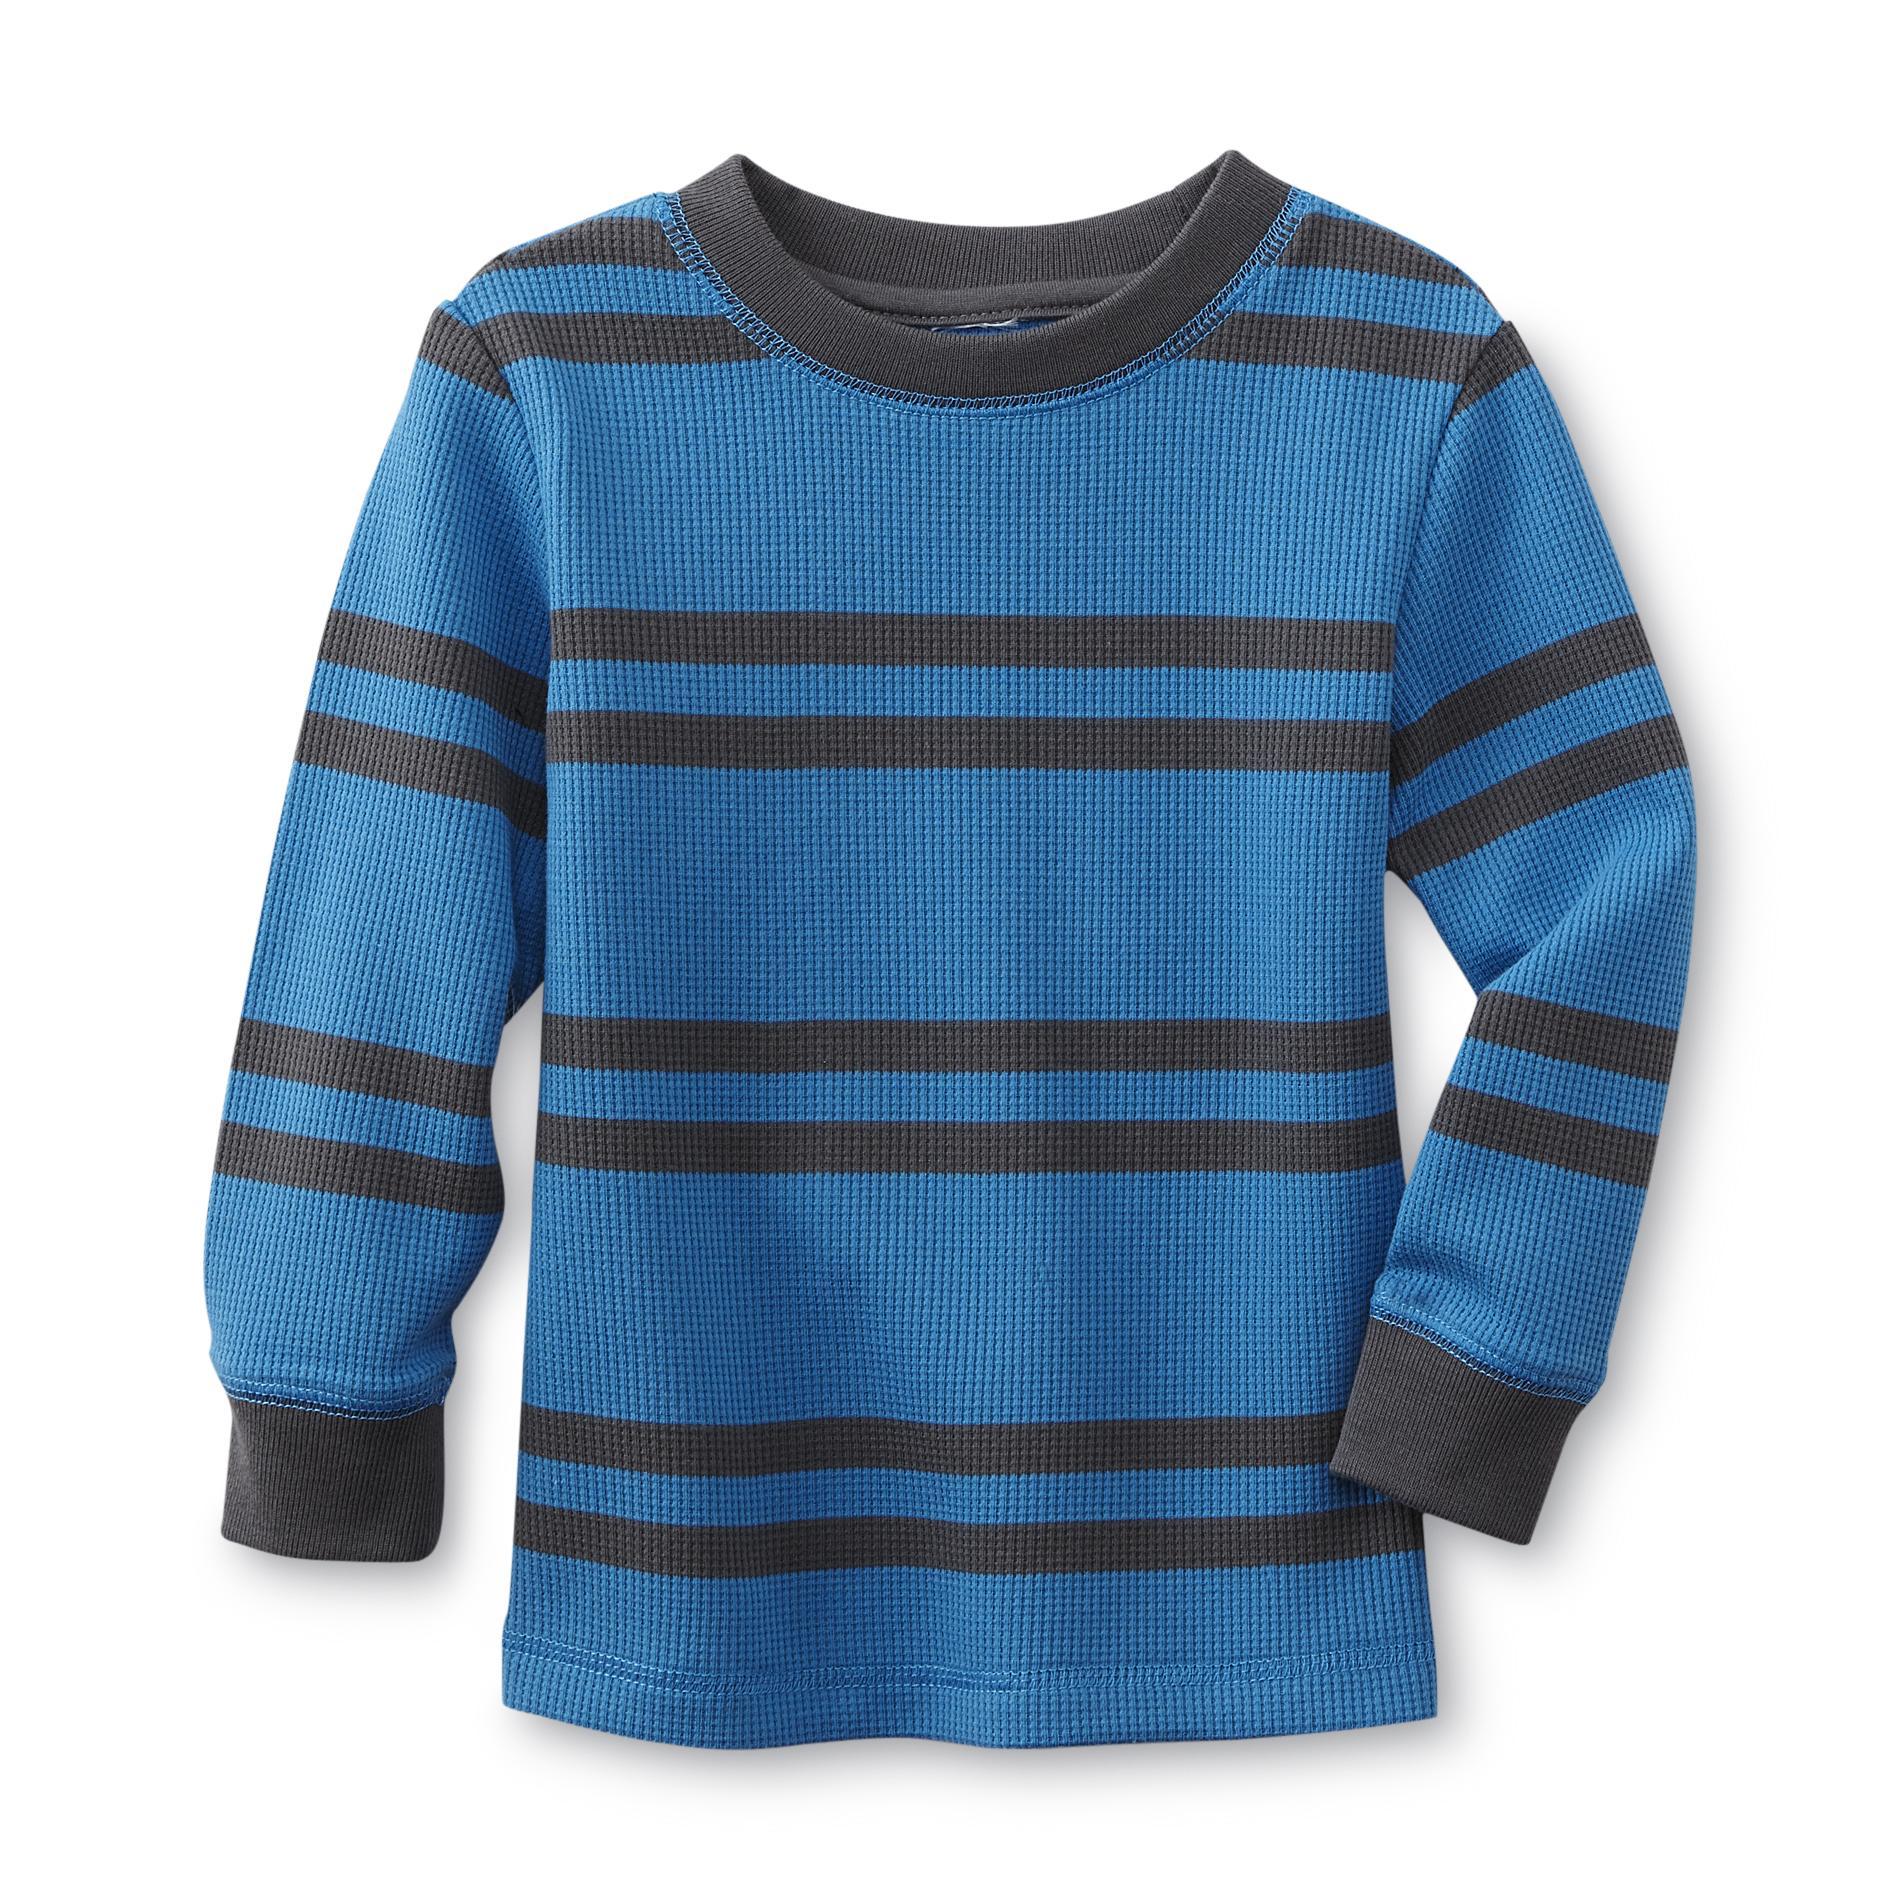 Toughskins Infant & Toddler Boy's Thermal Shirt - Striped